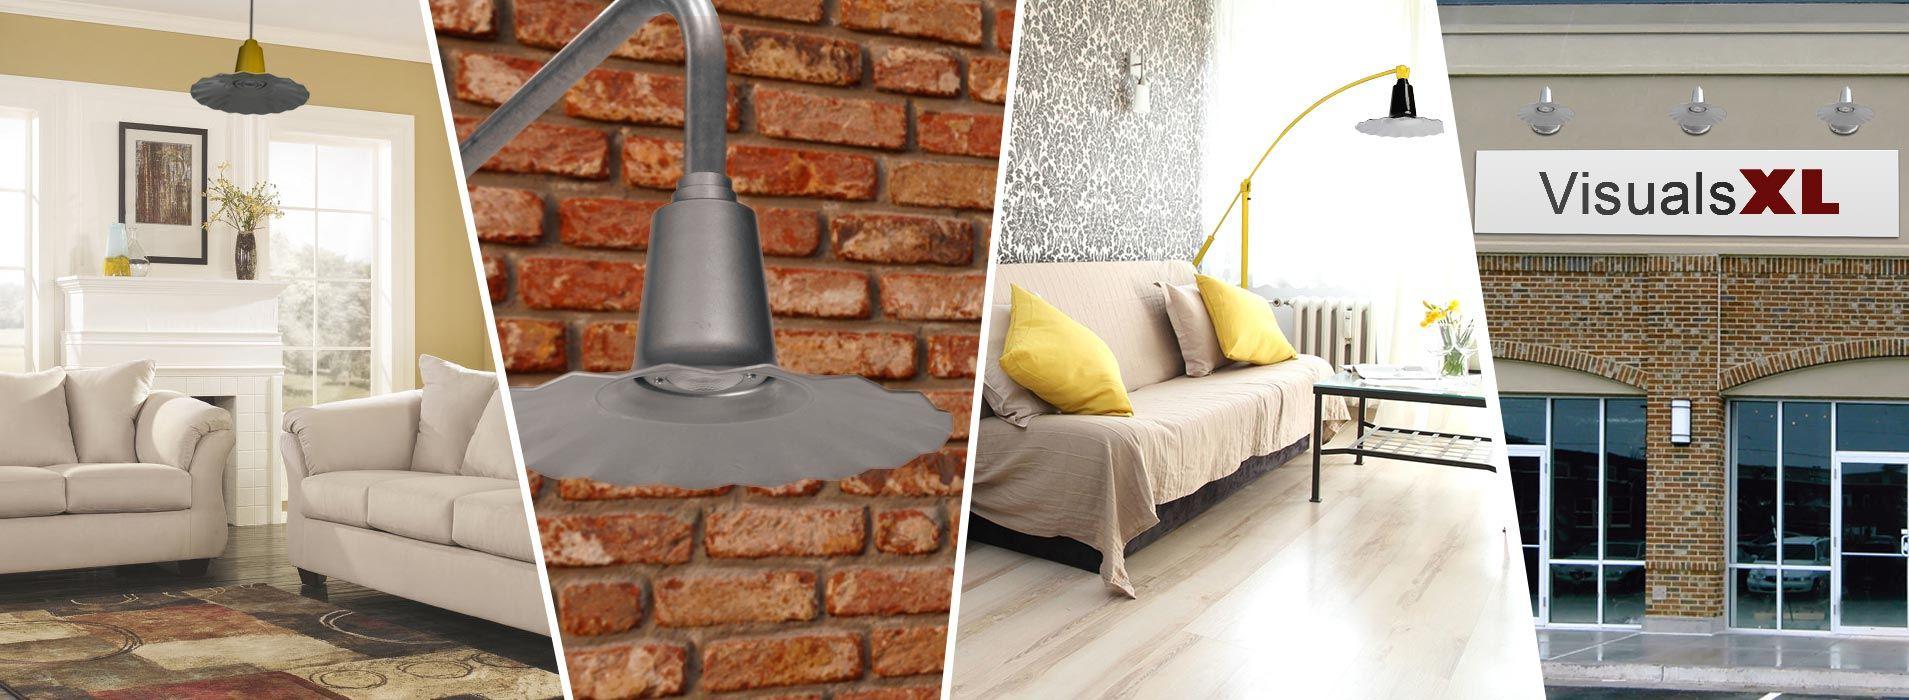 Customizable Iris Indoor LED Barn Pendant Light series